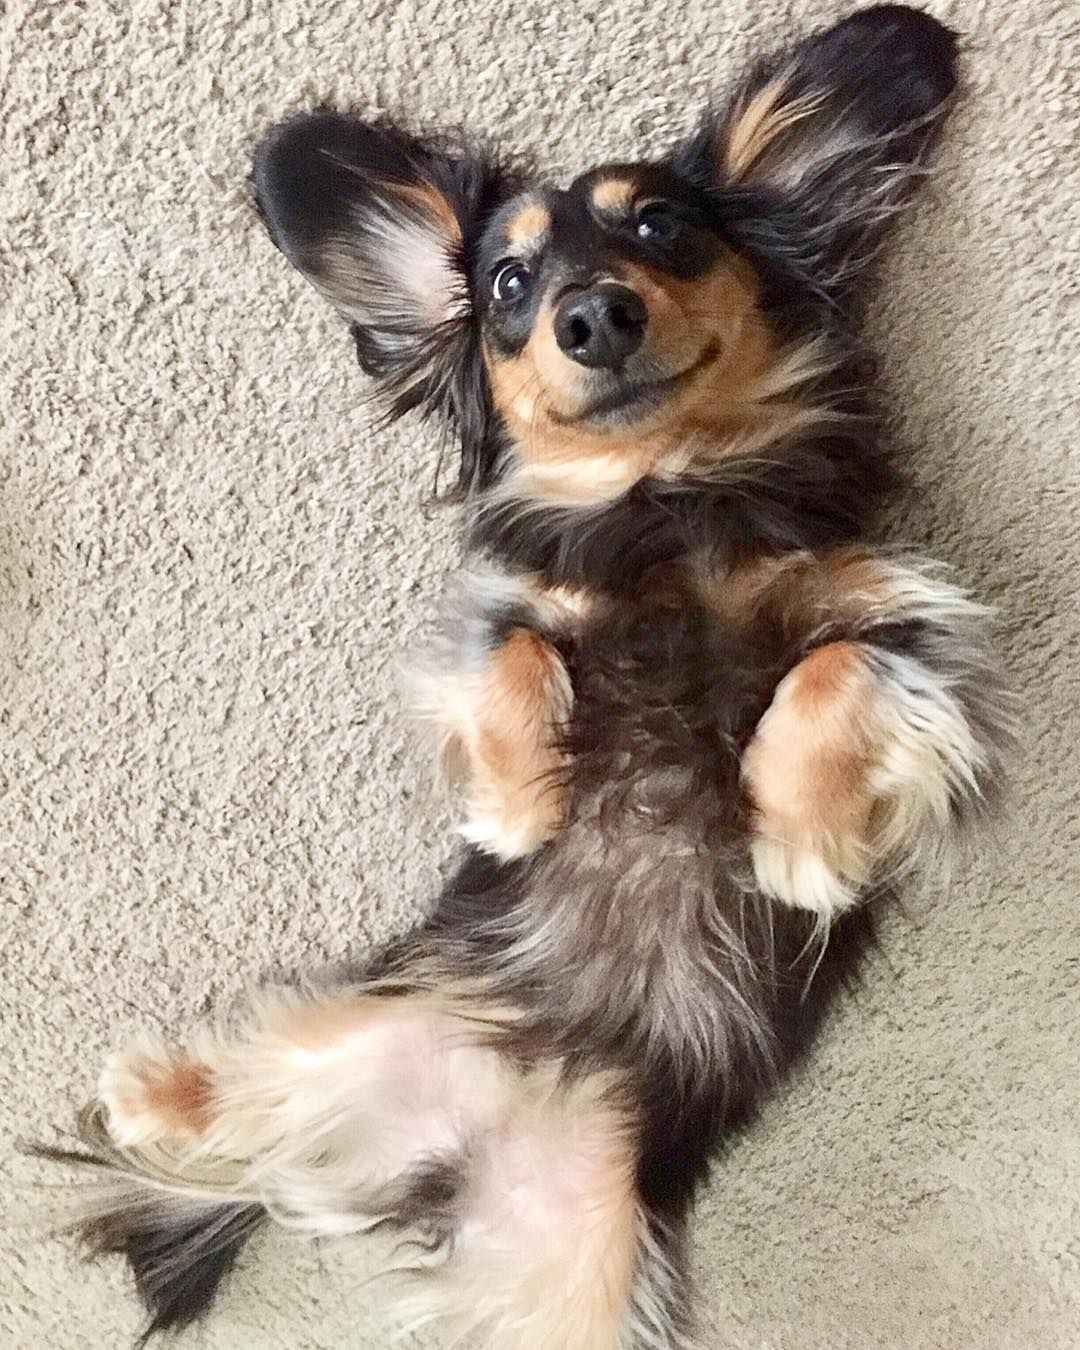 Cute dachshundcute dachshund dogscute dachshundscute